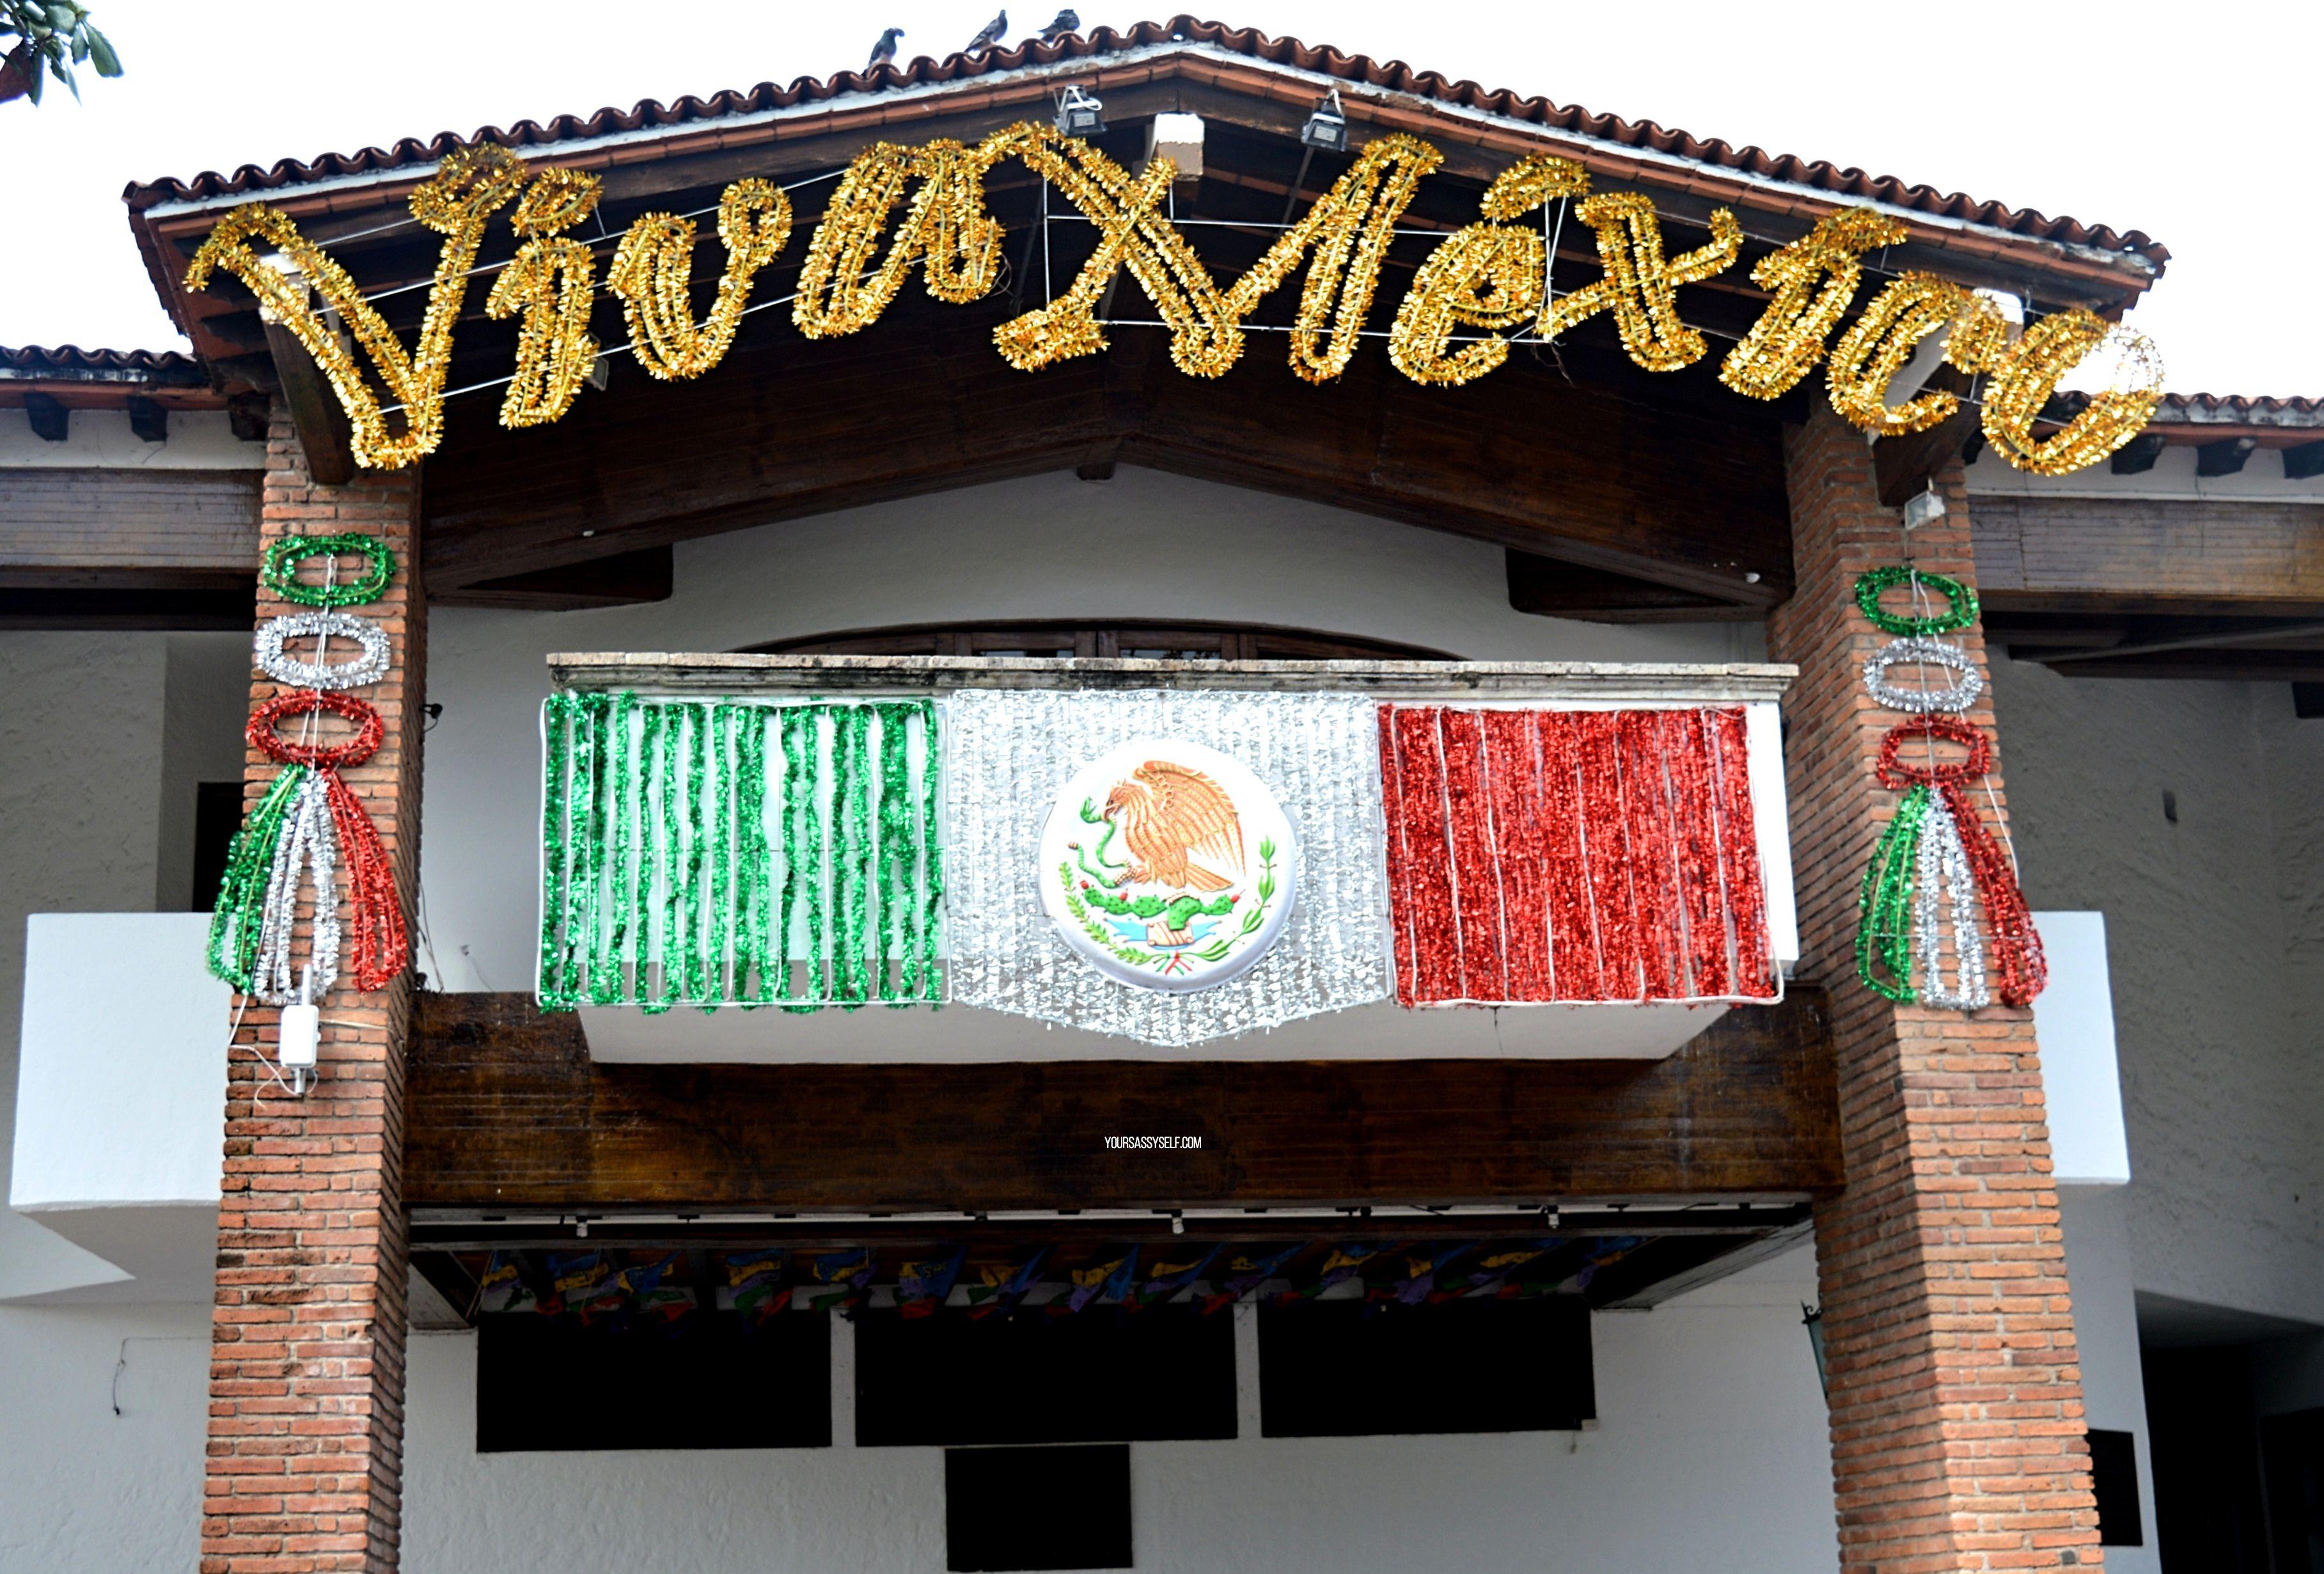 Viva Mexico banner - Puerto Vallarta - yoursassyself.com